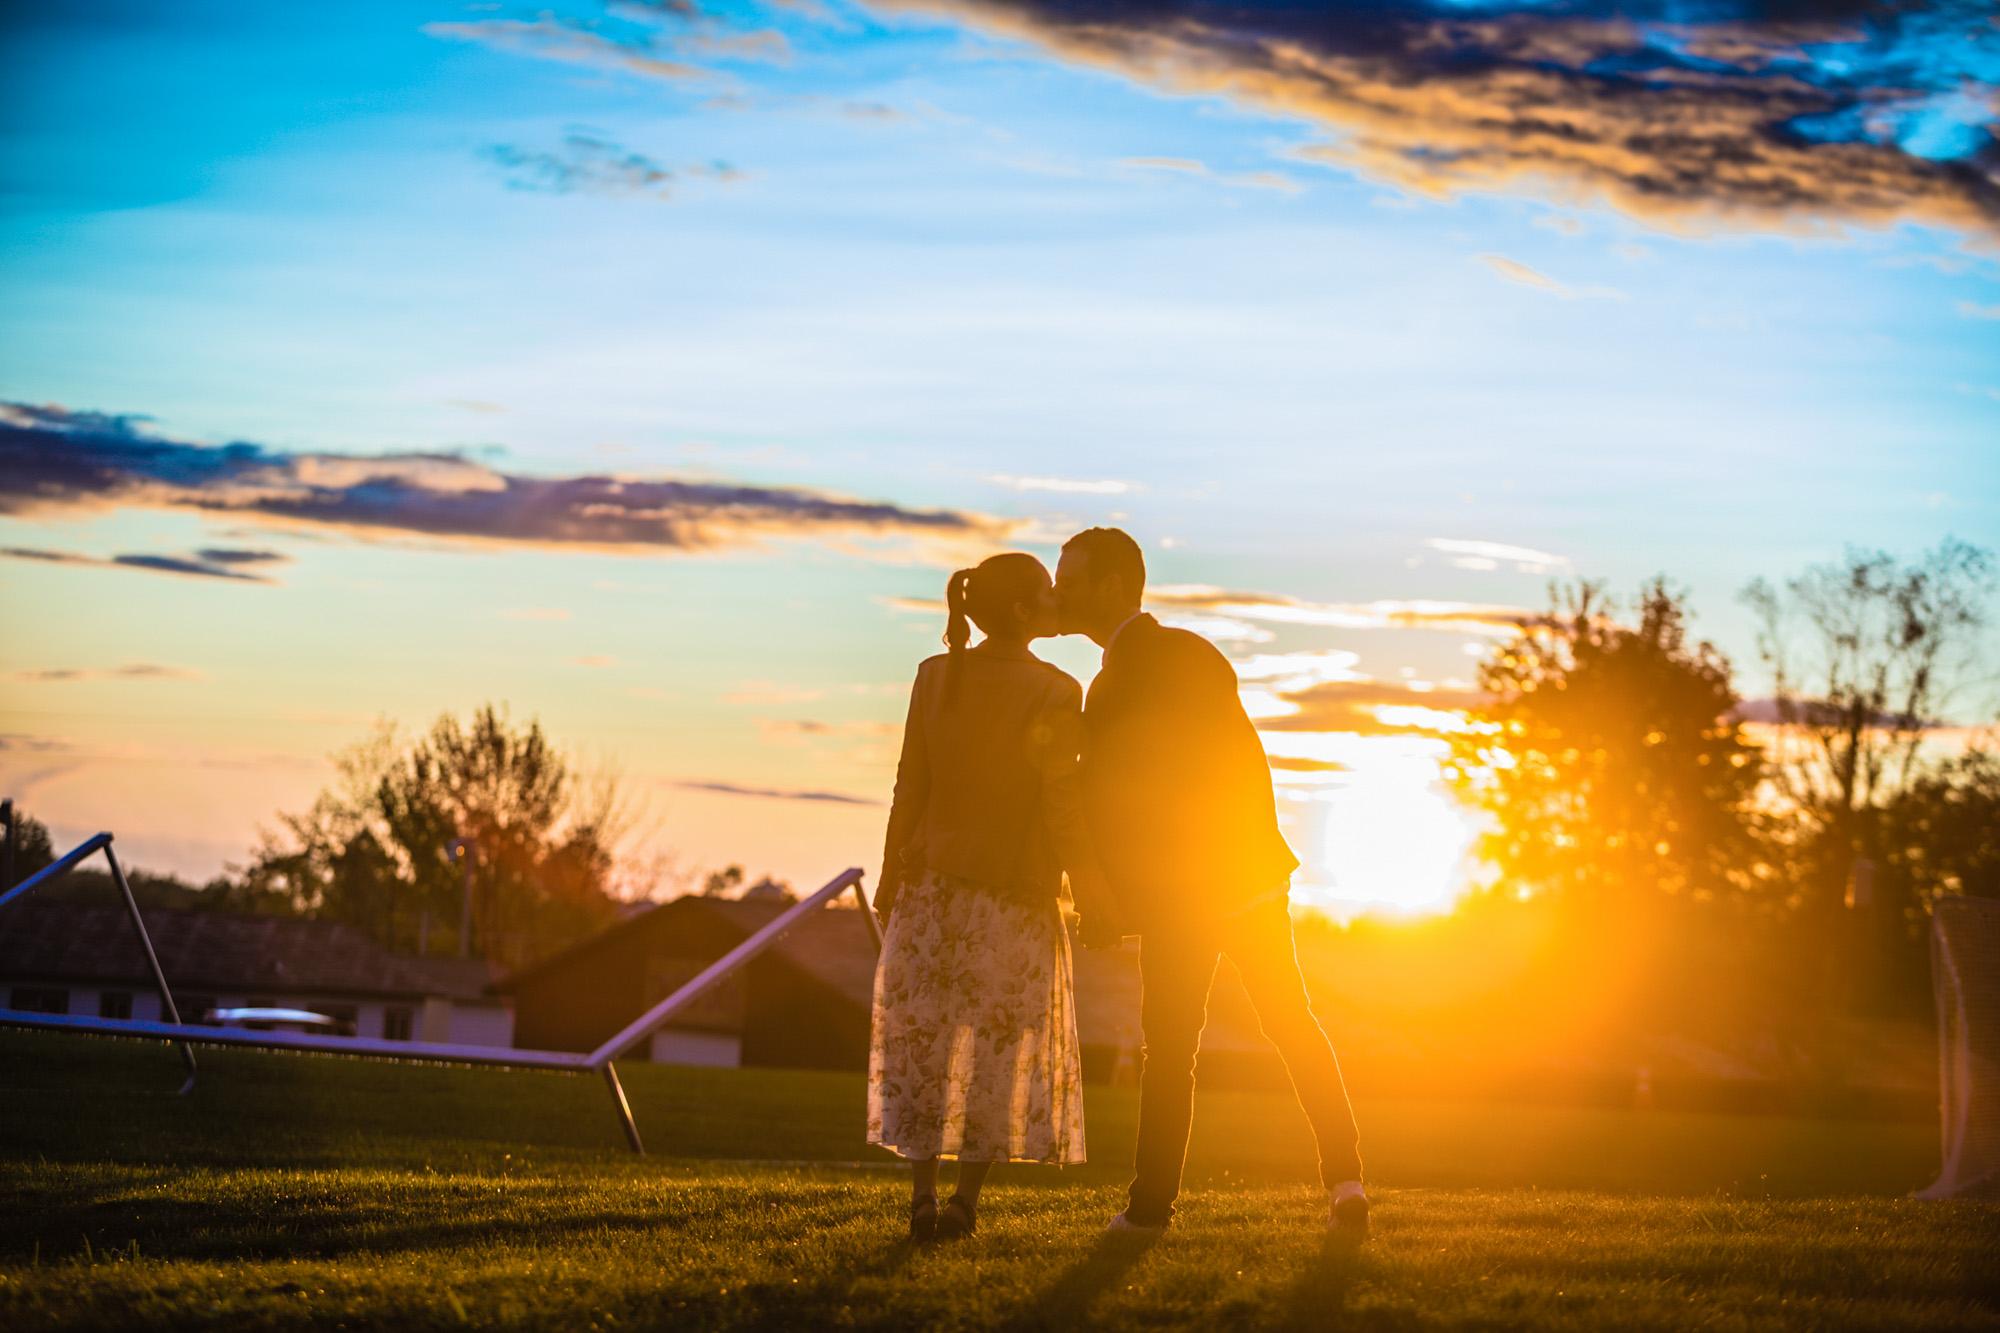 scranton_wedding_photographer_lettieri_pa (7 of 34).jpg